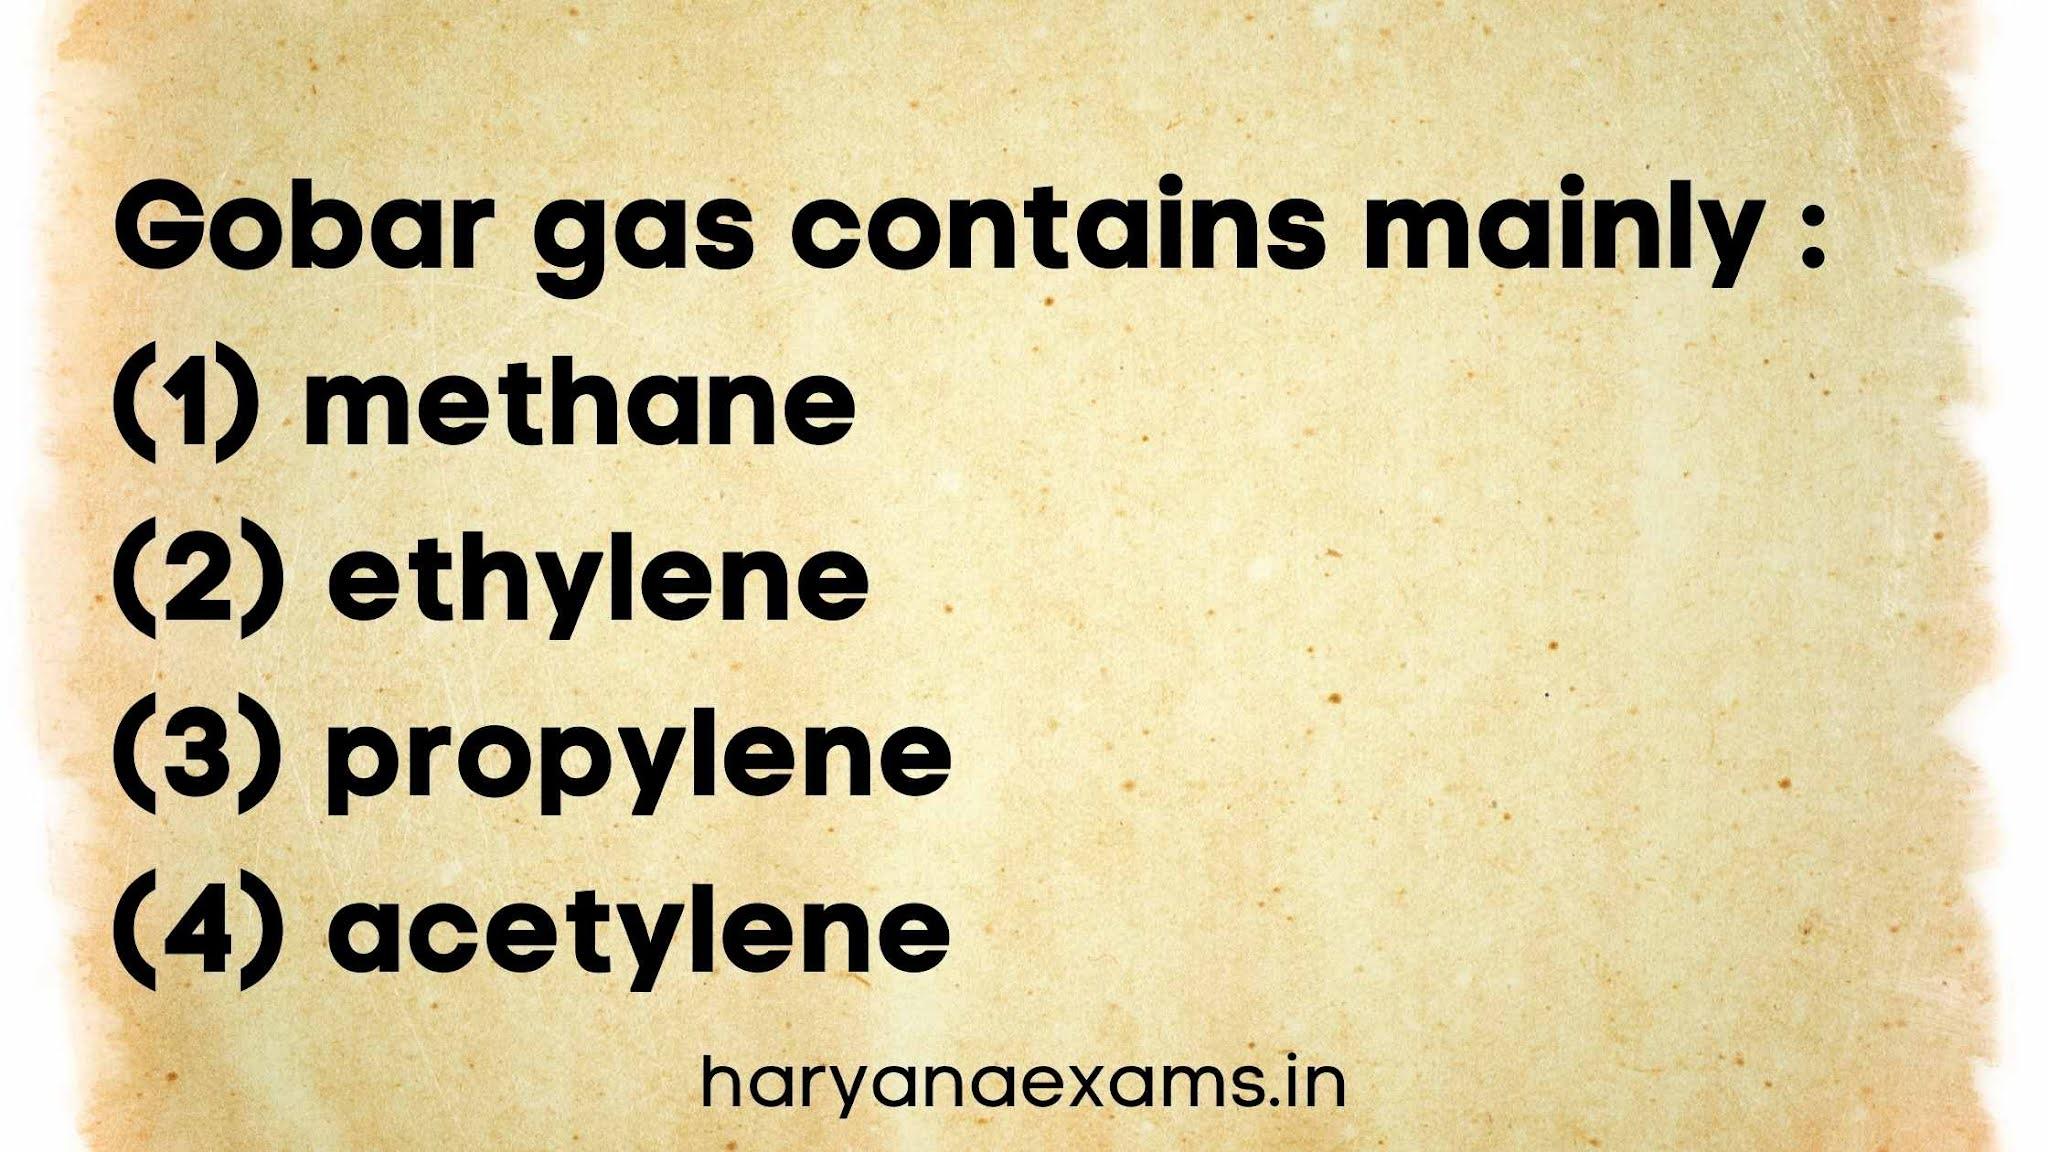 Gobar gas contains mainly :   (1) methane   (2) ethylene   (3) propylene   (4) acetylene